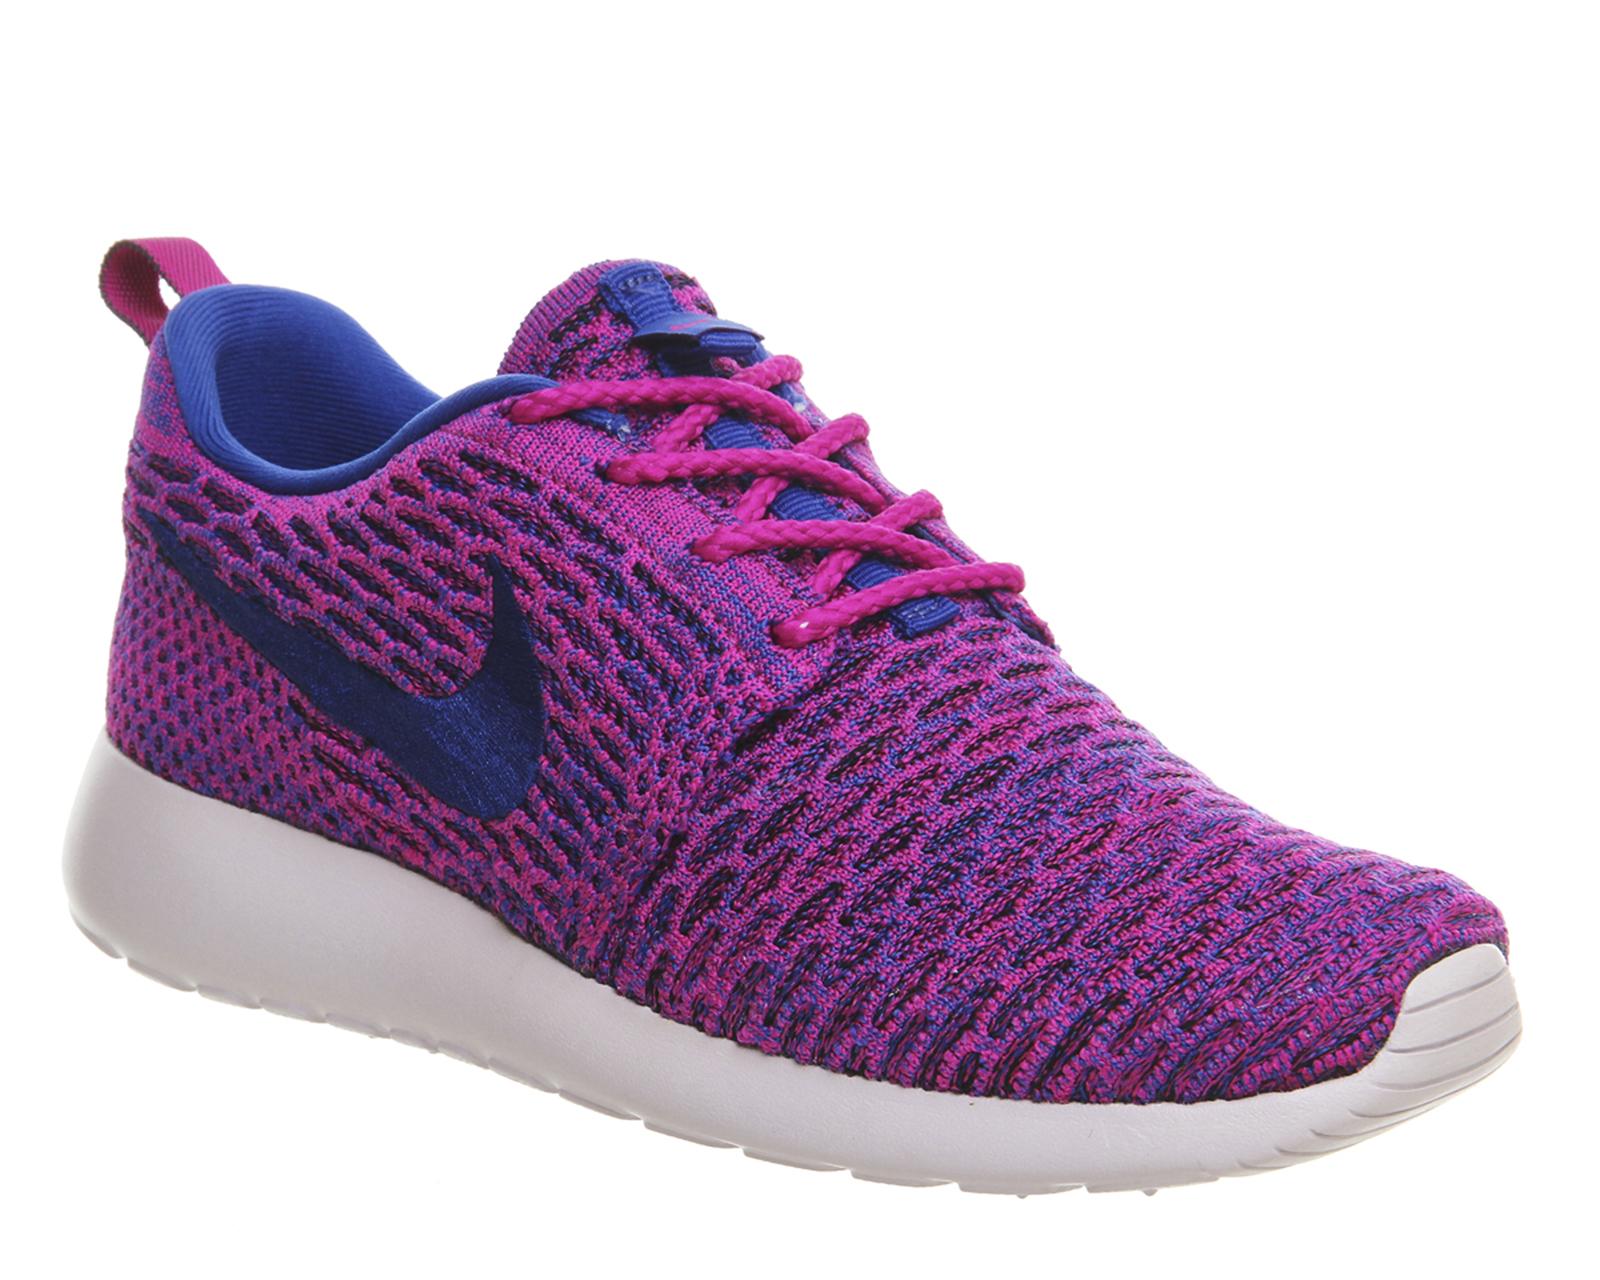 Nike Roshe Flyknit Womens Blazer Violet offres spéciales iEKD2j6K3W